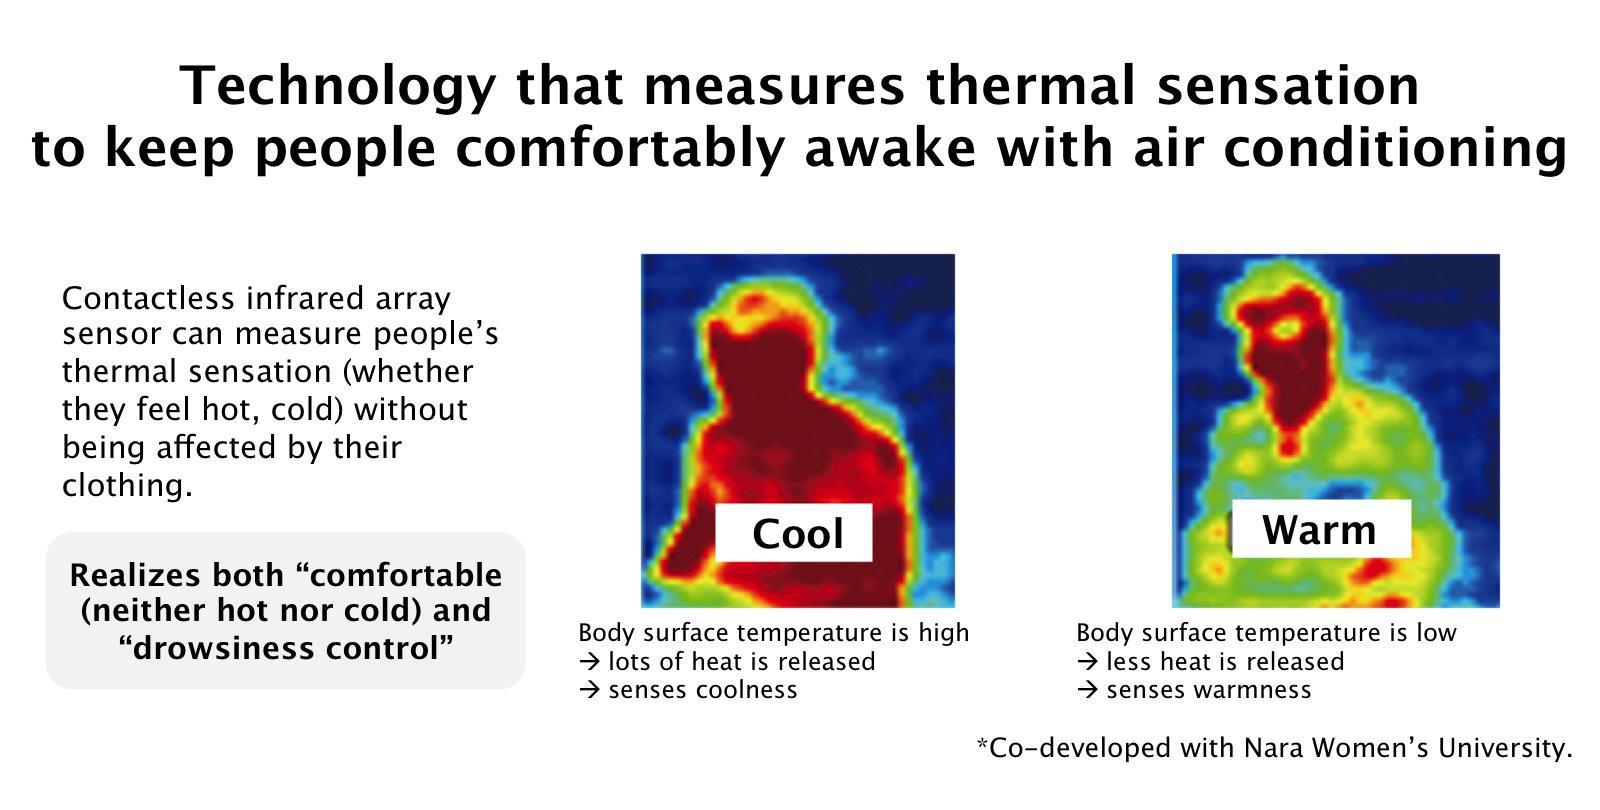 image of thermal sensation measurement